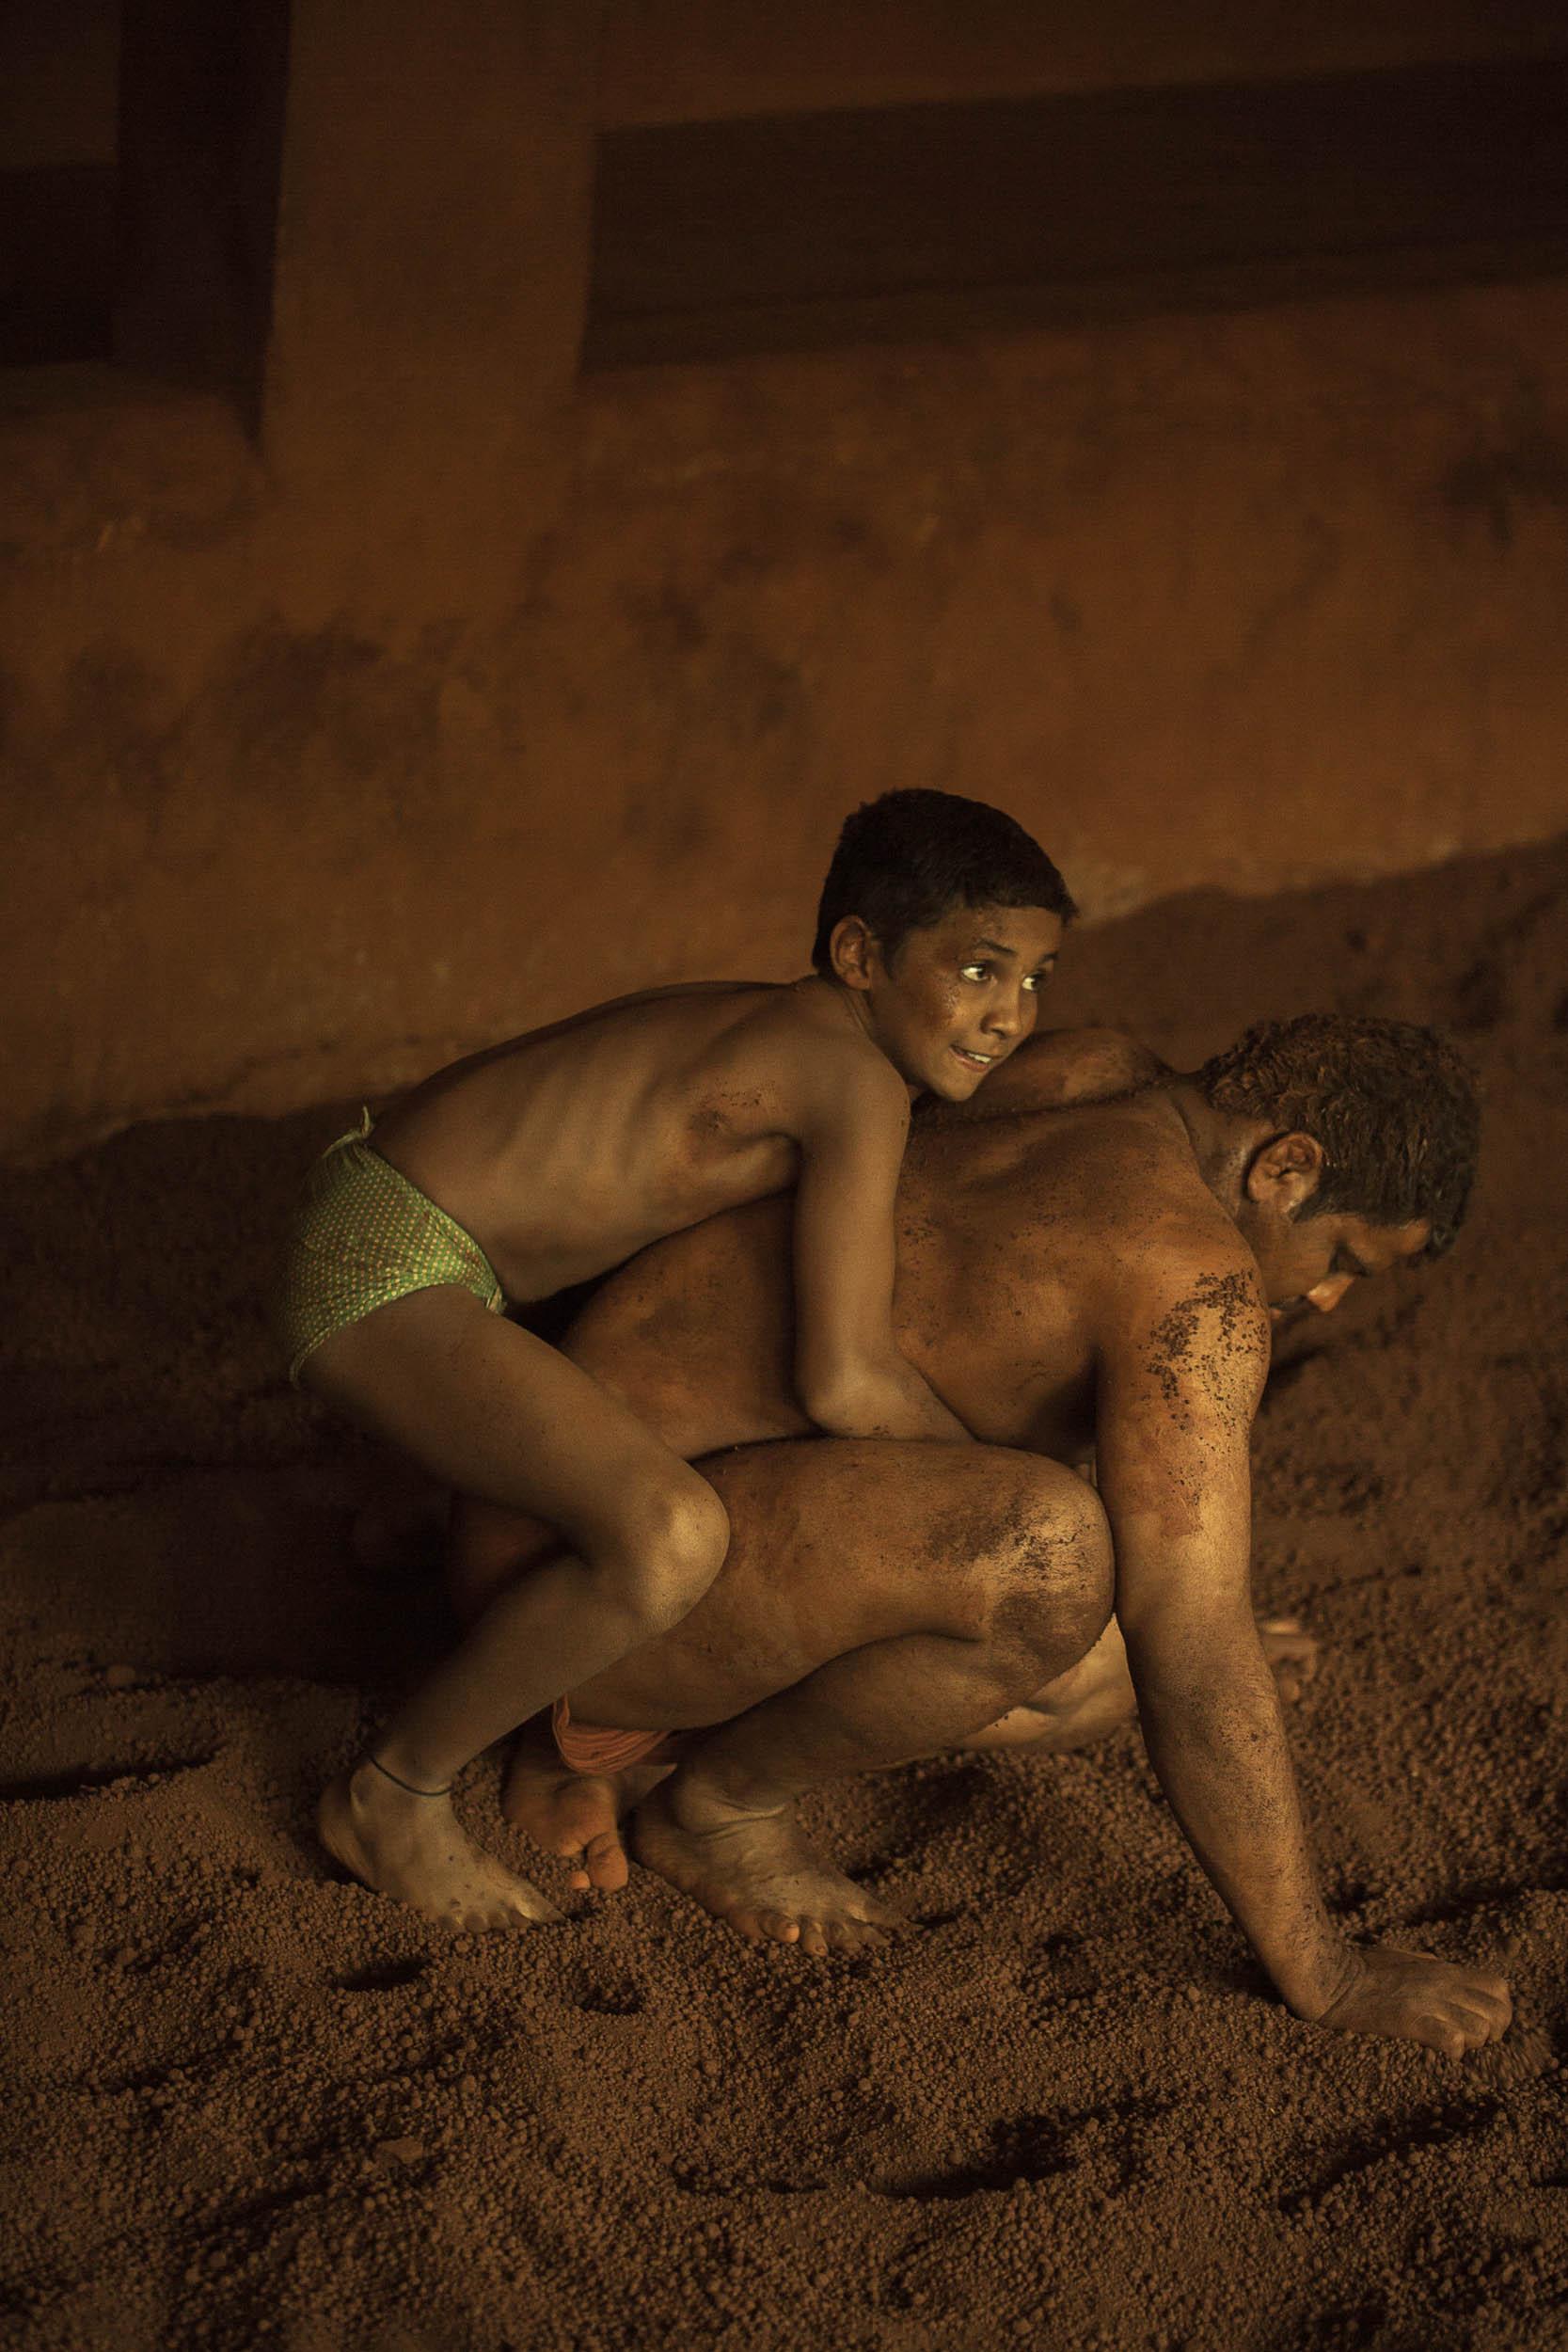 Sindhur_Photography_Travel_People_Wrestlers-27.JPG